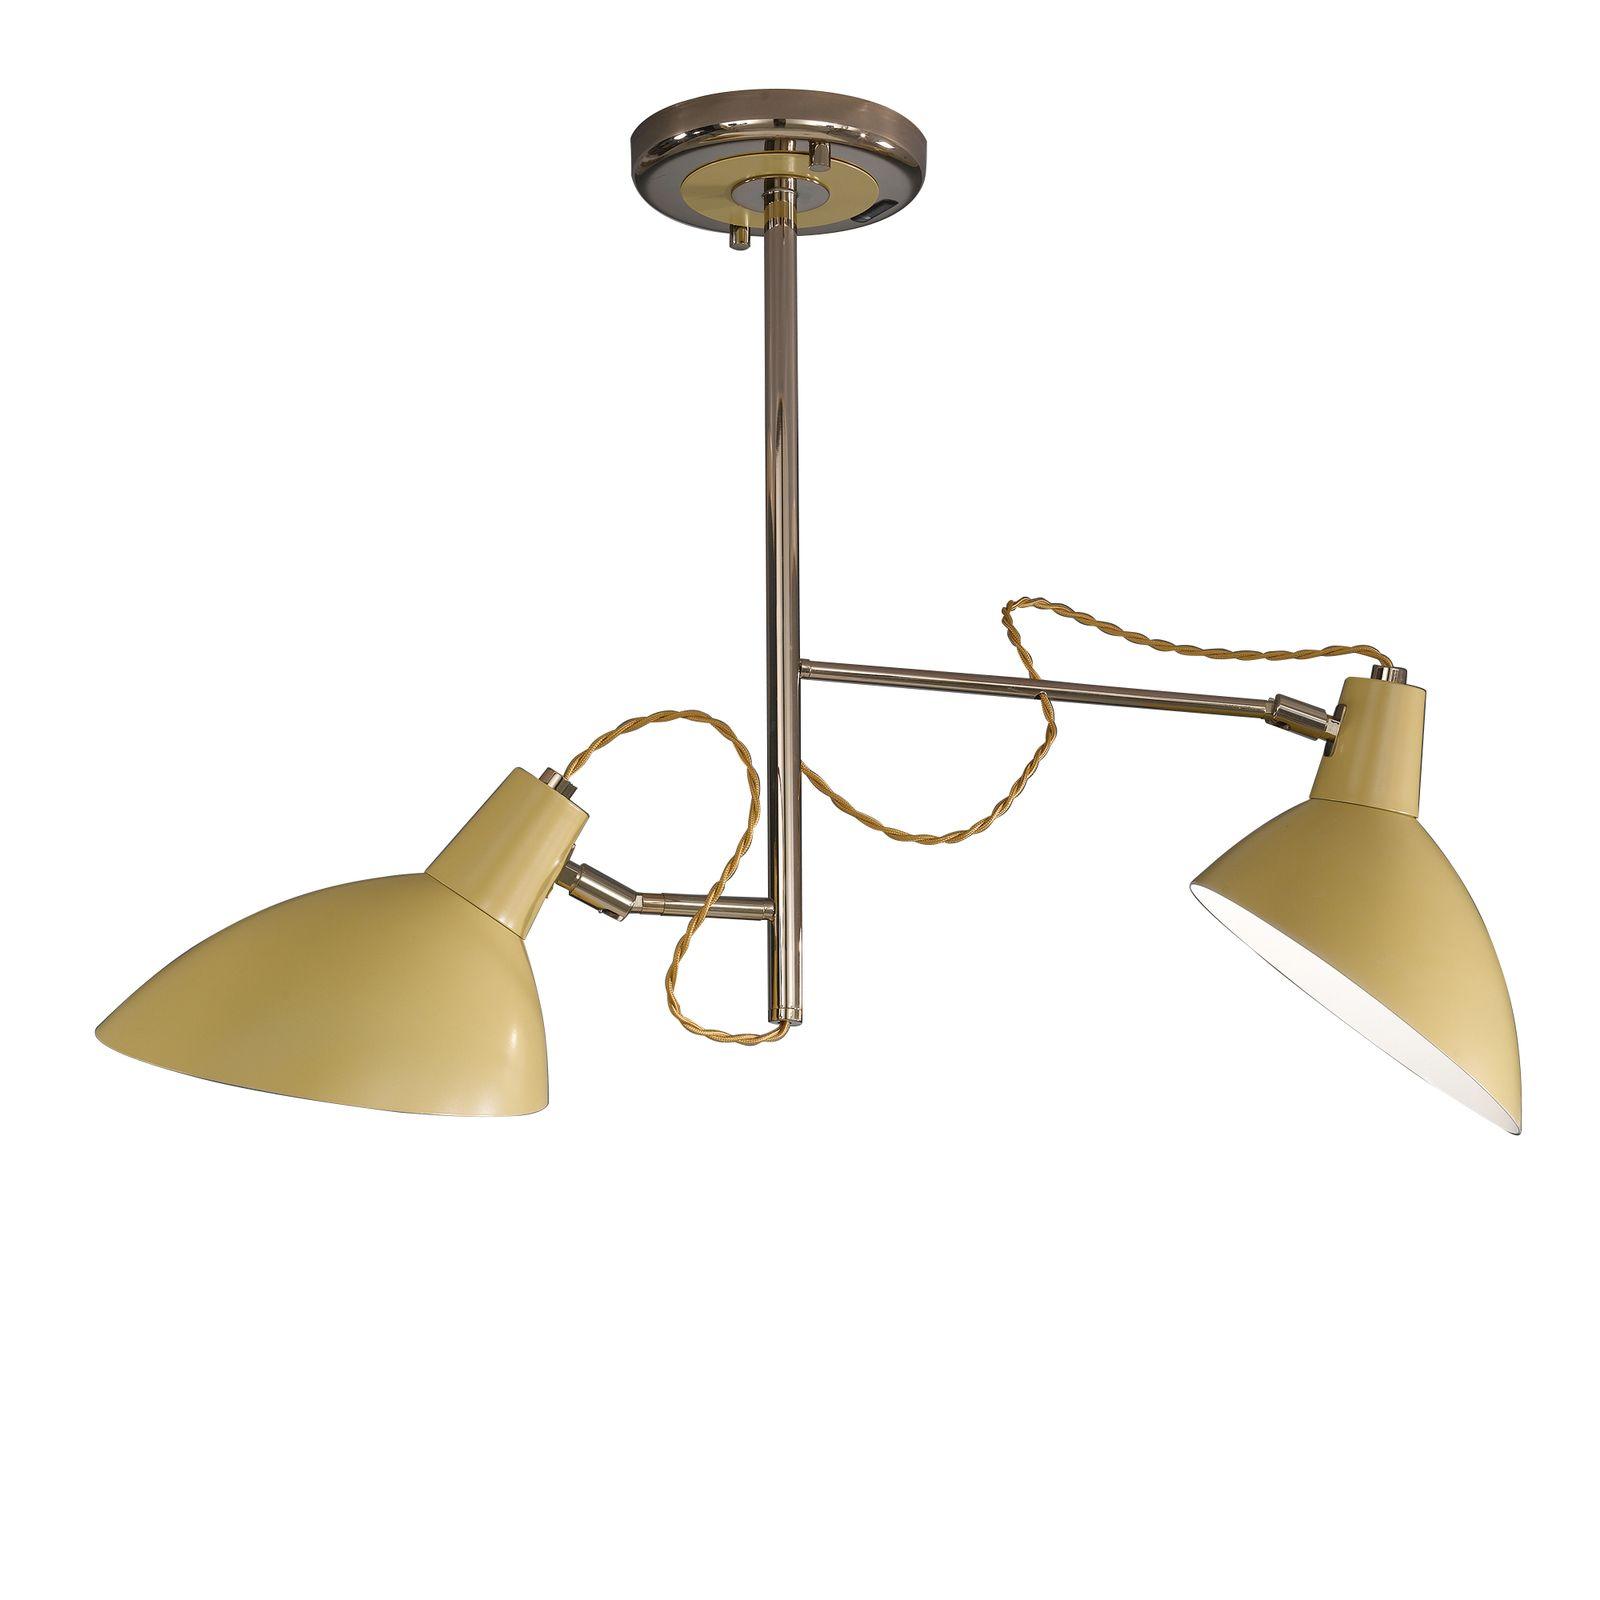 Retro Mustard 2 Light Ceiling Lamp Ceiling Lamp Ceiling Lights